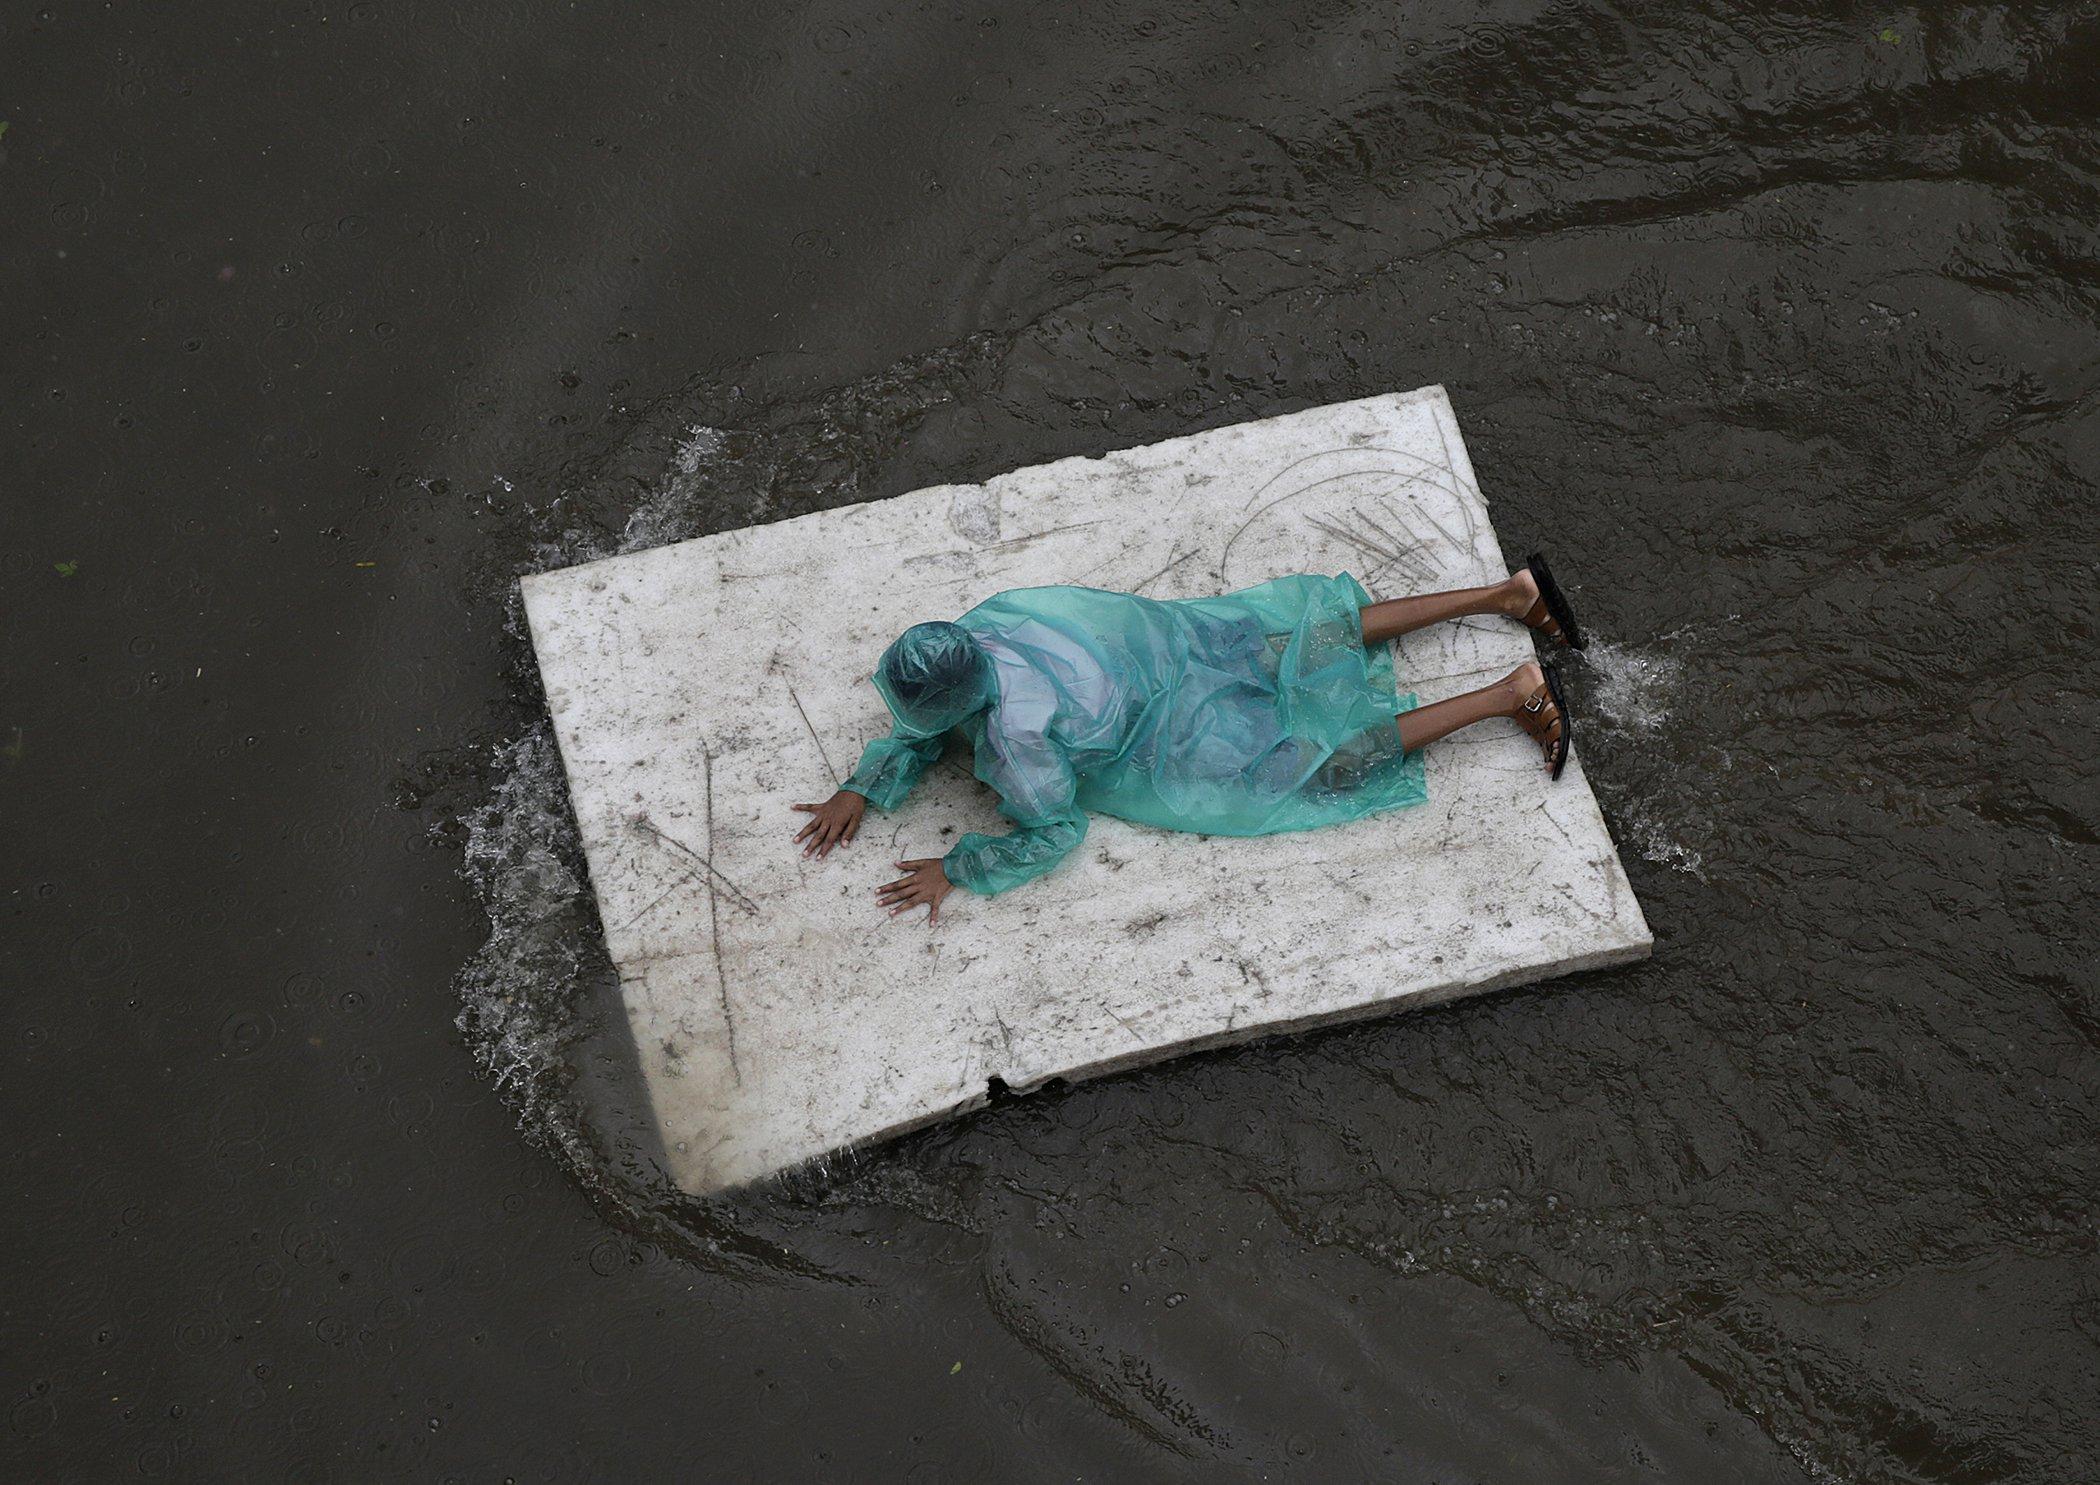 Environmental-Photos-July-India-Monsoon-Season.jpg